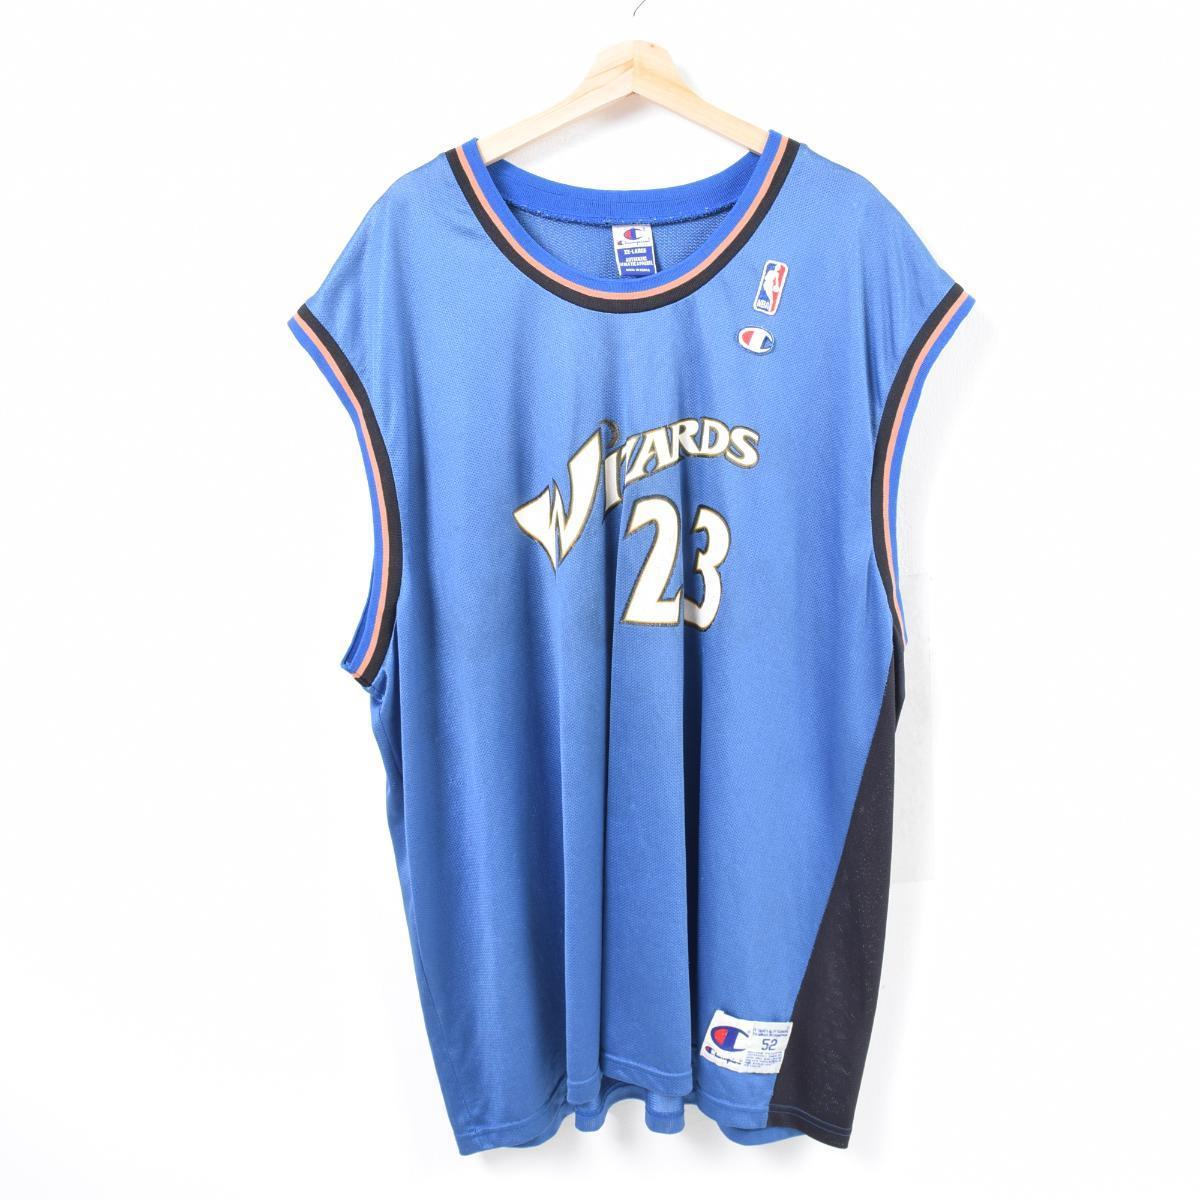 best sneakers 934e6 6e2f2 90s champion Champion NBA WASHINGTON WIZARDS Washington Wizards MICHAEL  JORDAN Michael Jordan game shirt replica uniform men XXL /waq7246